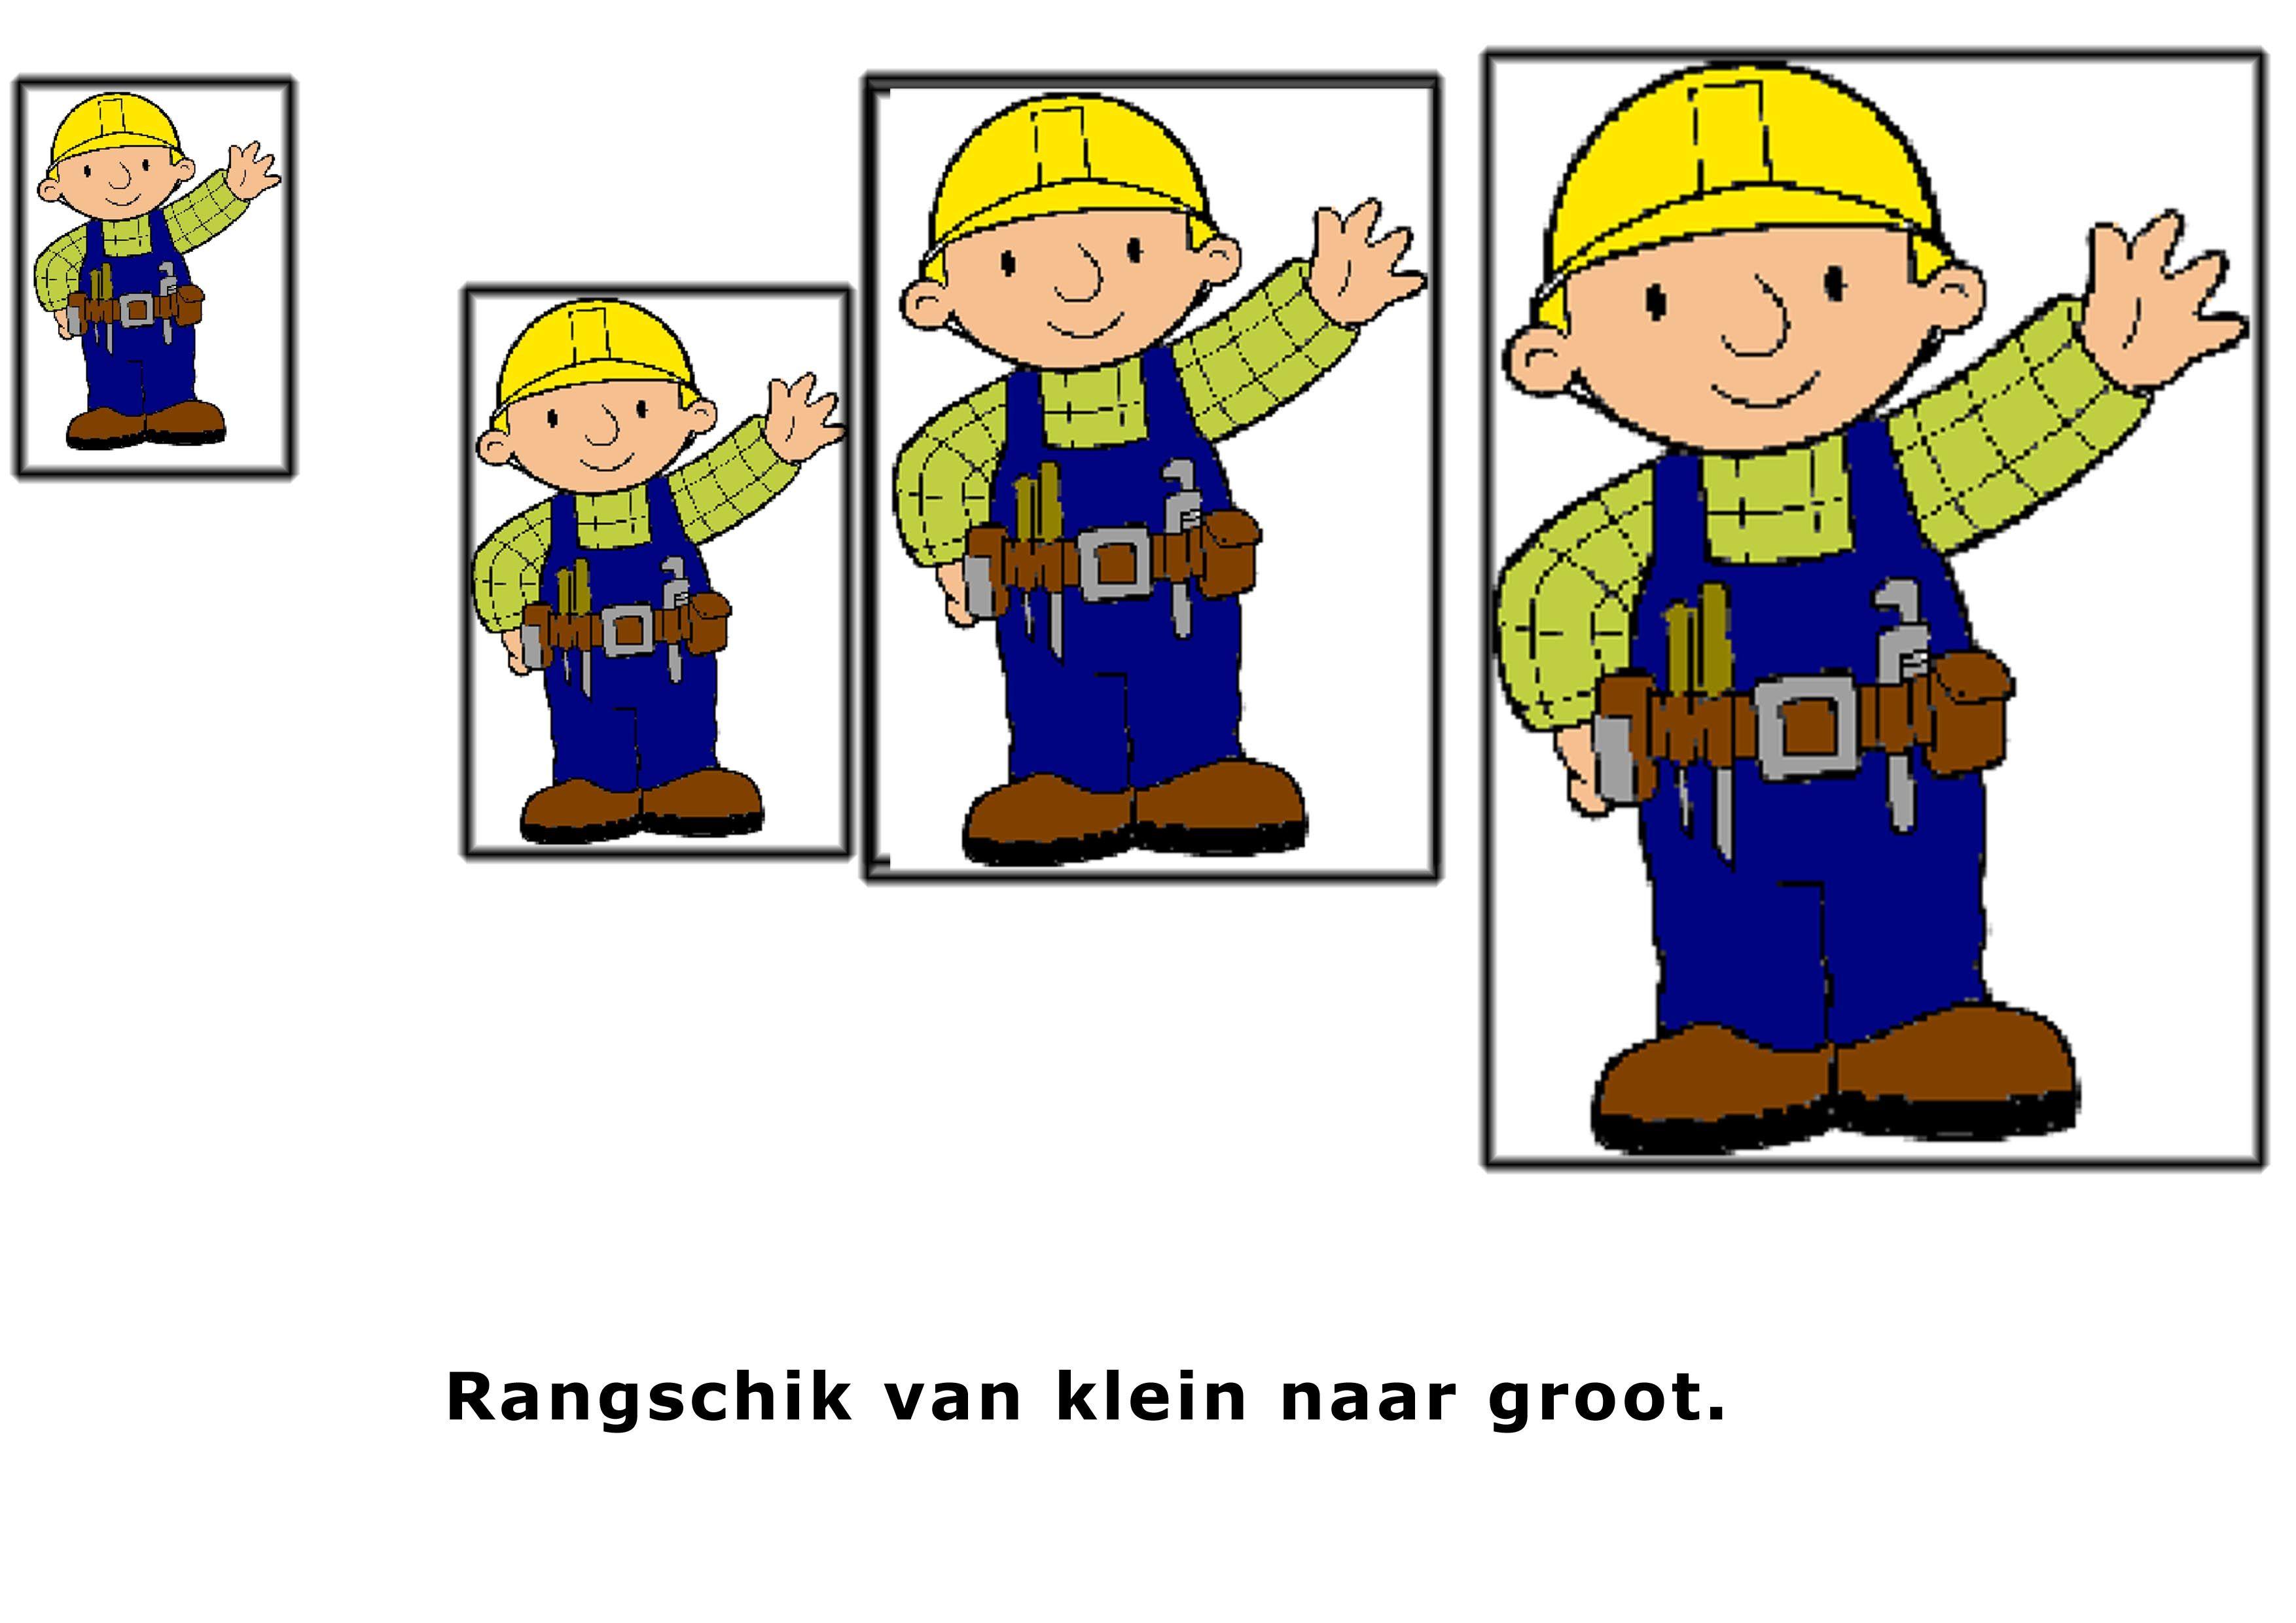 Pin Van Paula Prevoo Op Bouwen Lesideeen Bouw Thema Bouw Thema